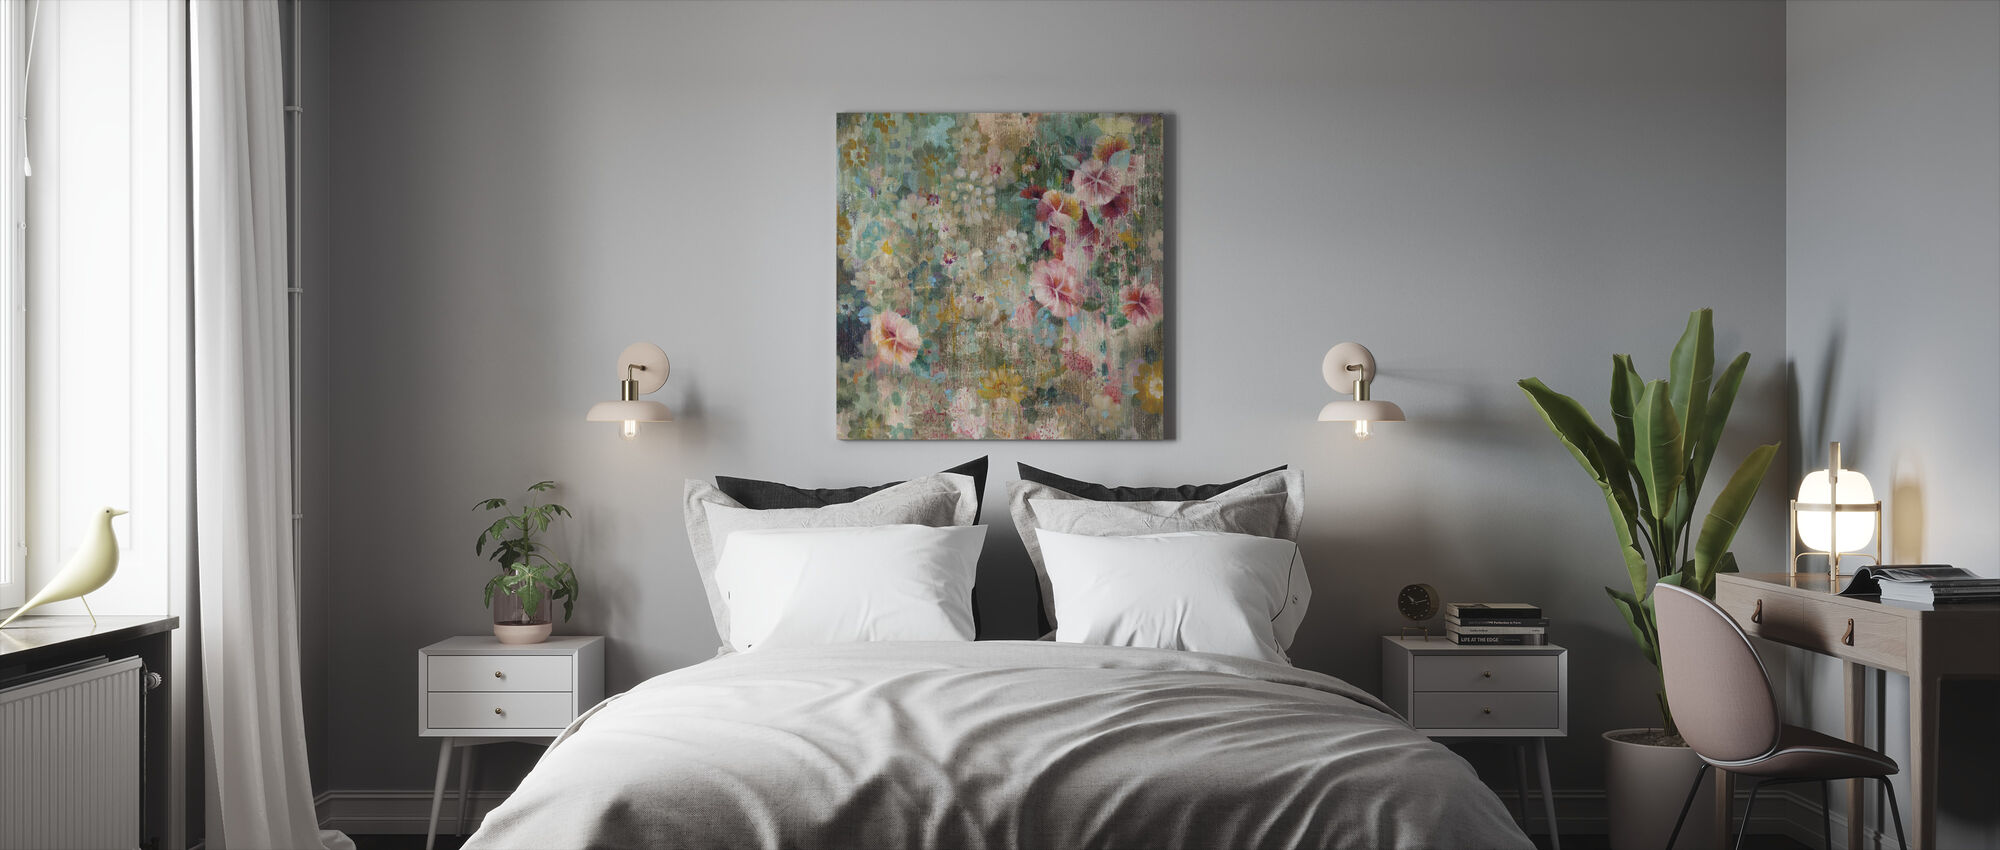 Flower Shower - Canvas print - Bedroom